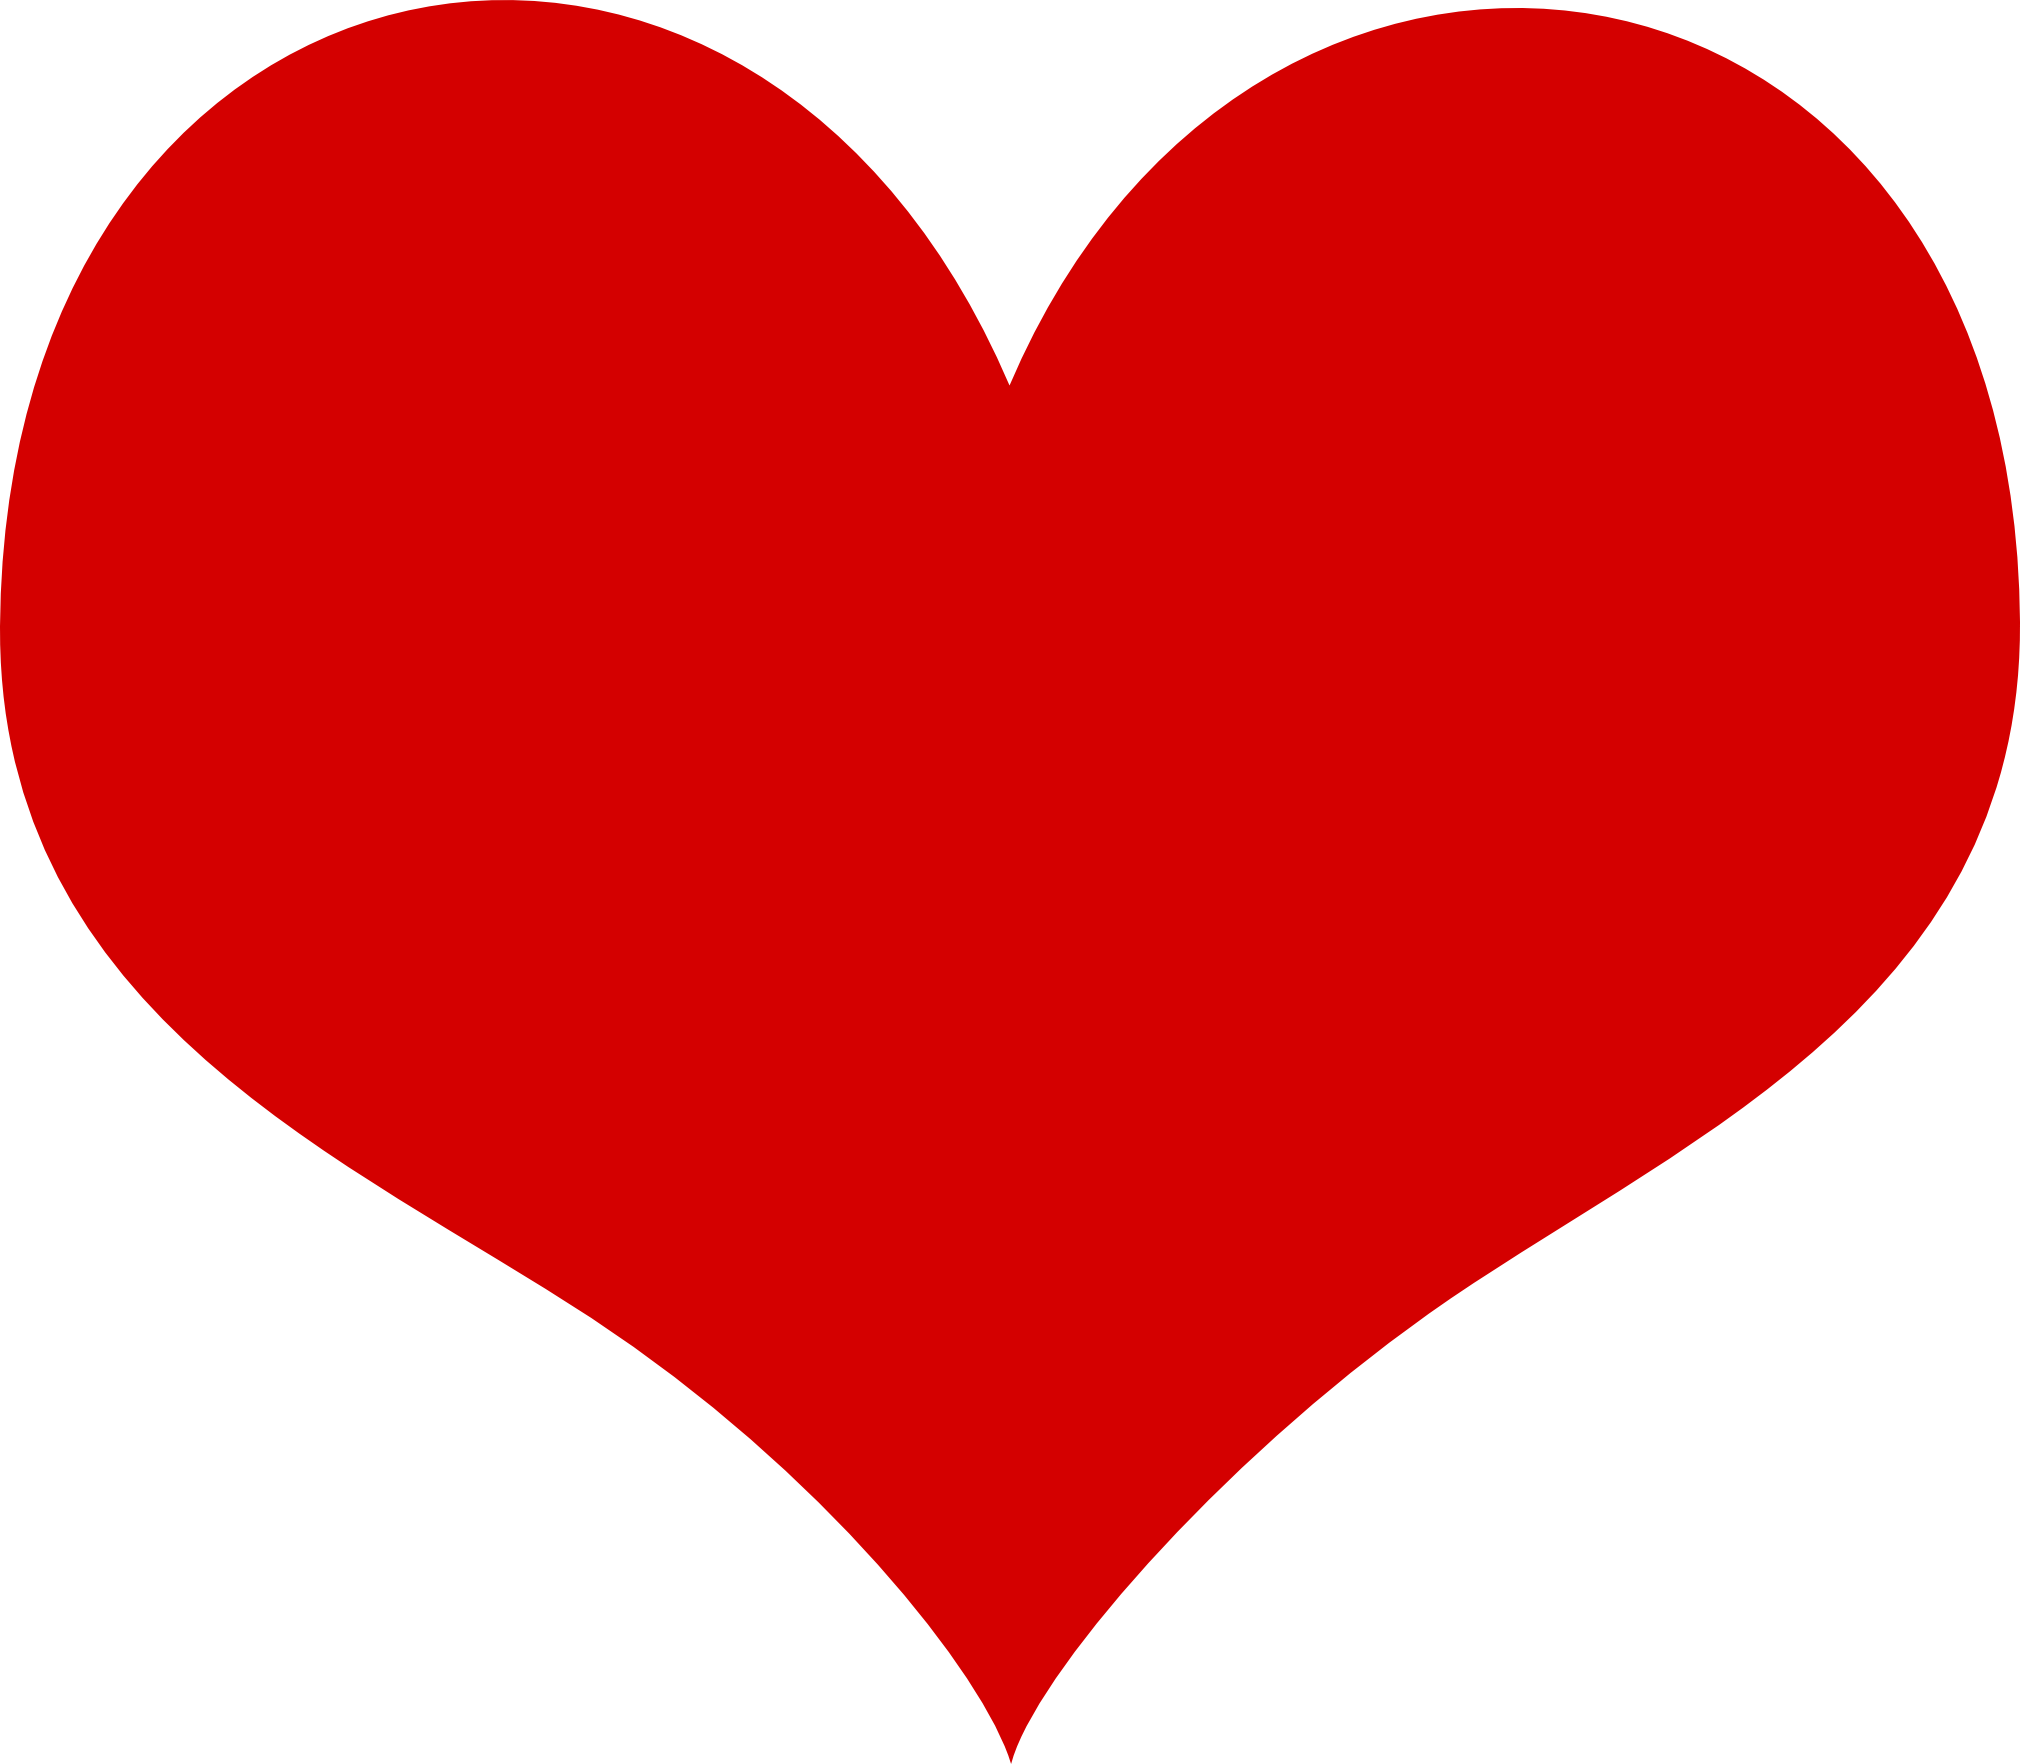 heart clipart - Clip Art Hearts